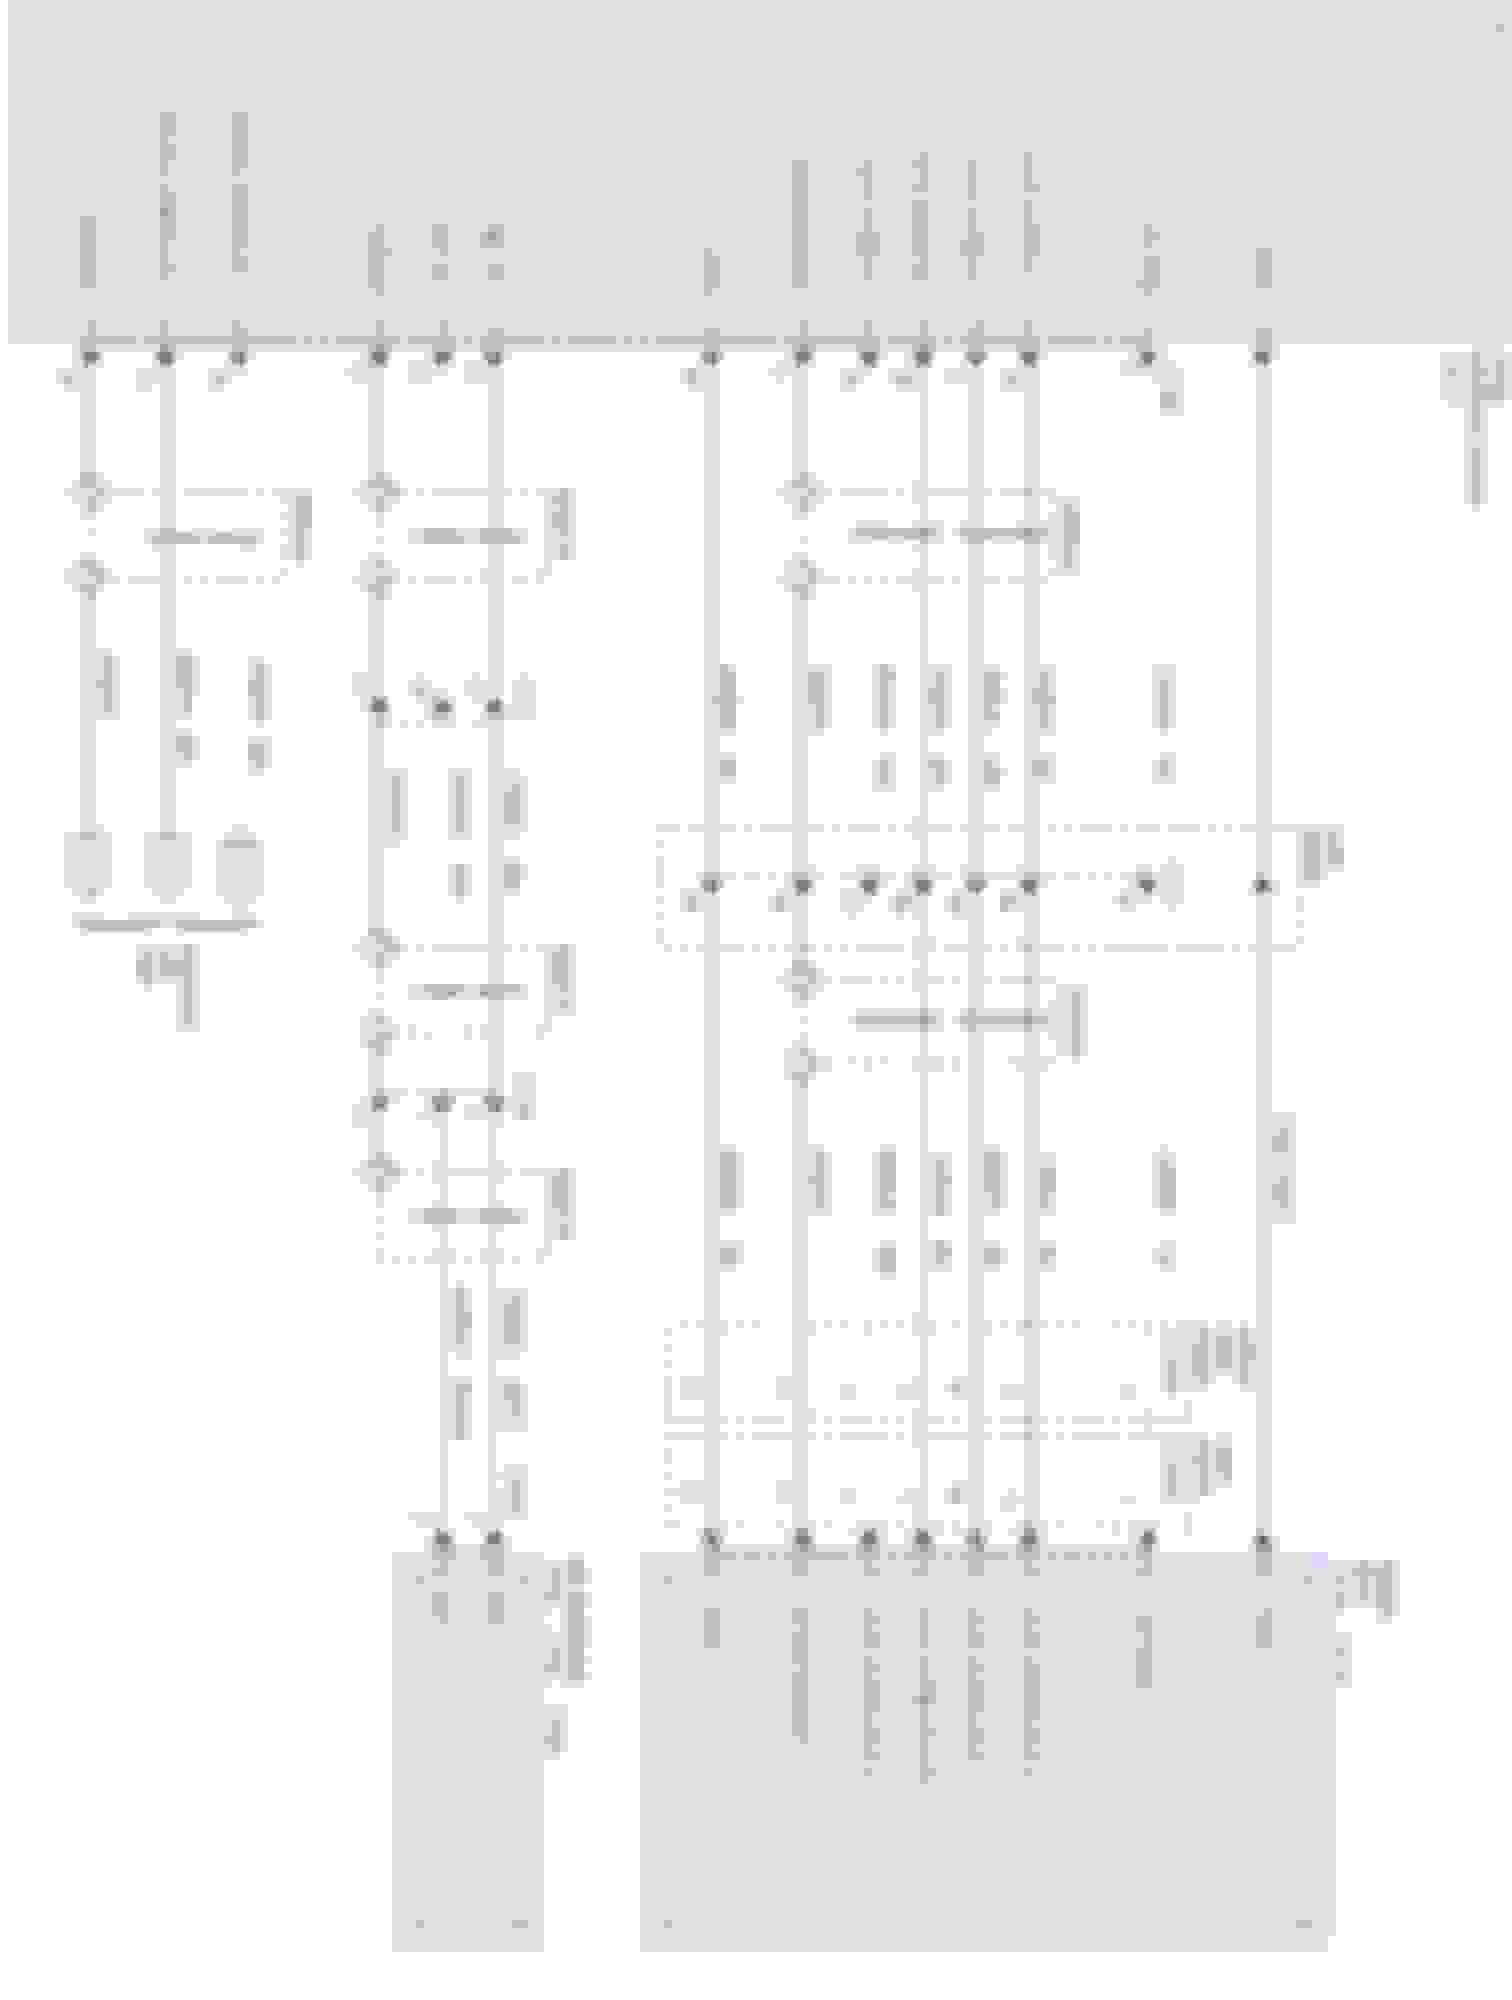 2015 media hub with SD reader wiring diagram - Ford F150 ... on electrical diagrams, switch diagrams, lighting diagrams, electronic circuit diagrams, internet of things diagrams, troubleshooting diagrams, engine diagrams, gmc fuse box diagrams, hvac diagrams, smart car diagrams, transformer diagrams, friendship bracelet diagrams, pinout diagrams, battery diagrams, series and parallel circuits diagrams, led circuit diagrams, motor diagrams, sincgars radio configurations diagrams, honda motorcycle repair diagrams,